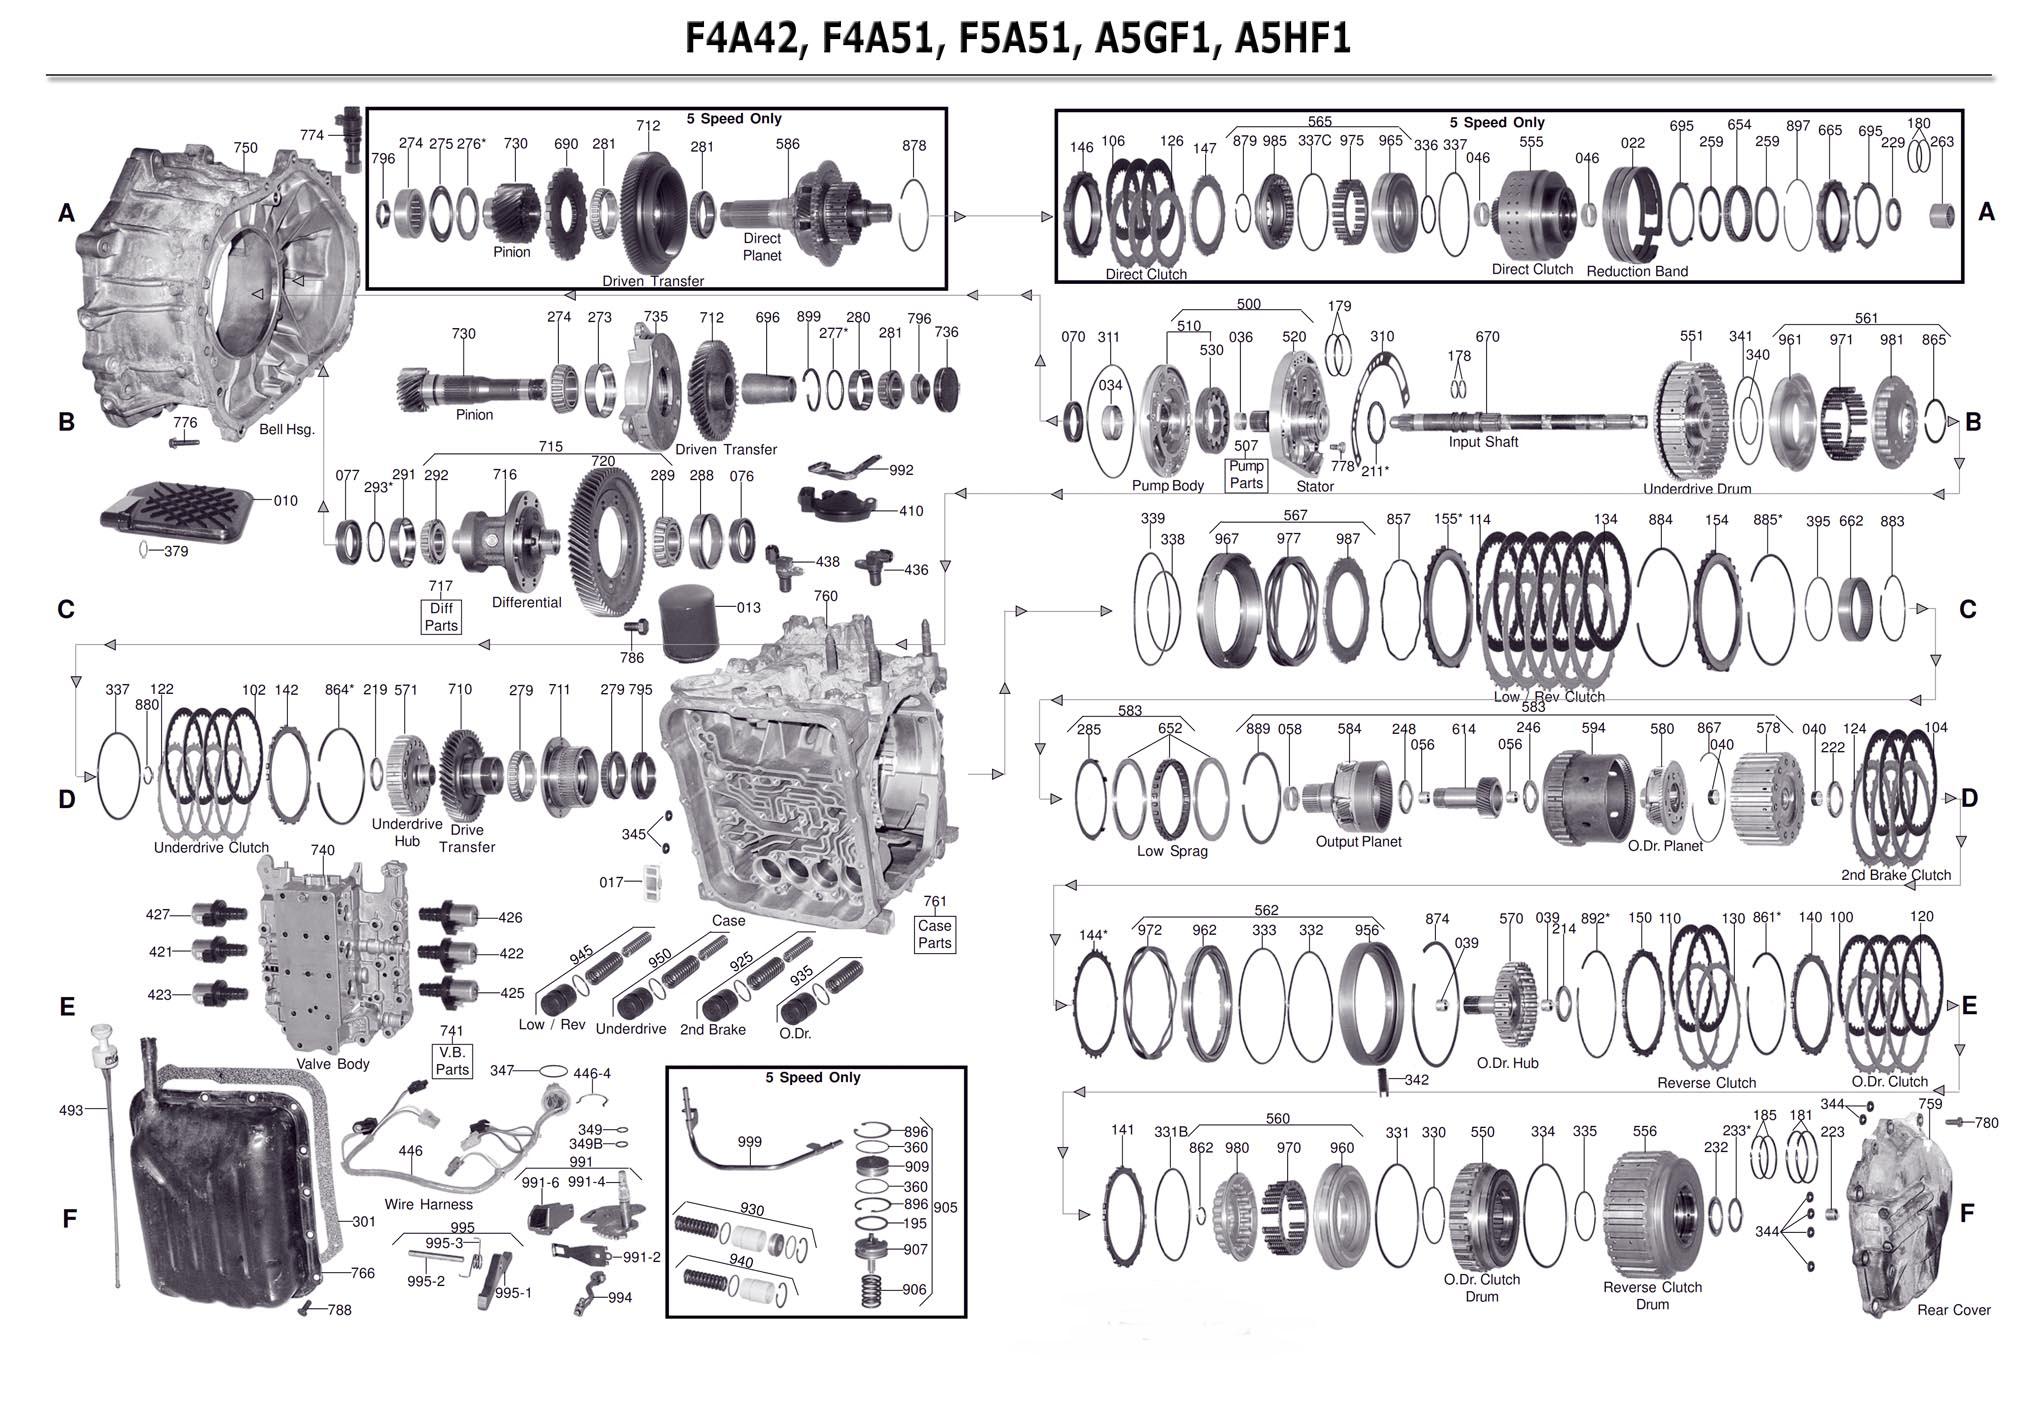 Transmission Repair Manuals F4a41 F4a42 F5a51 F4a51